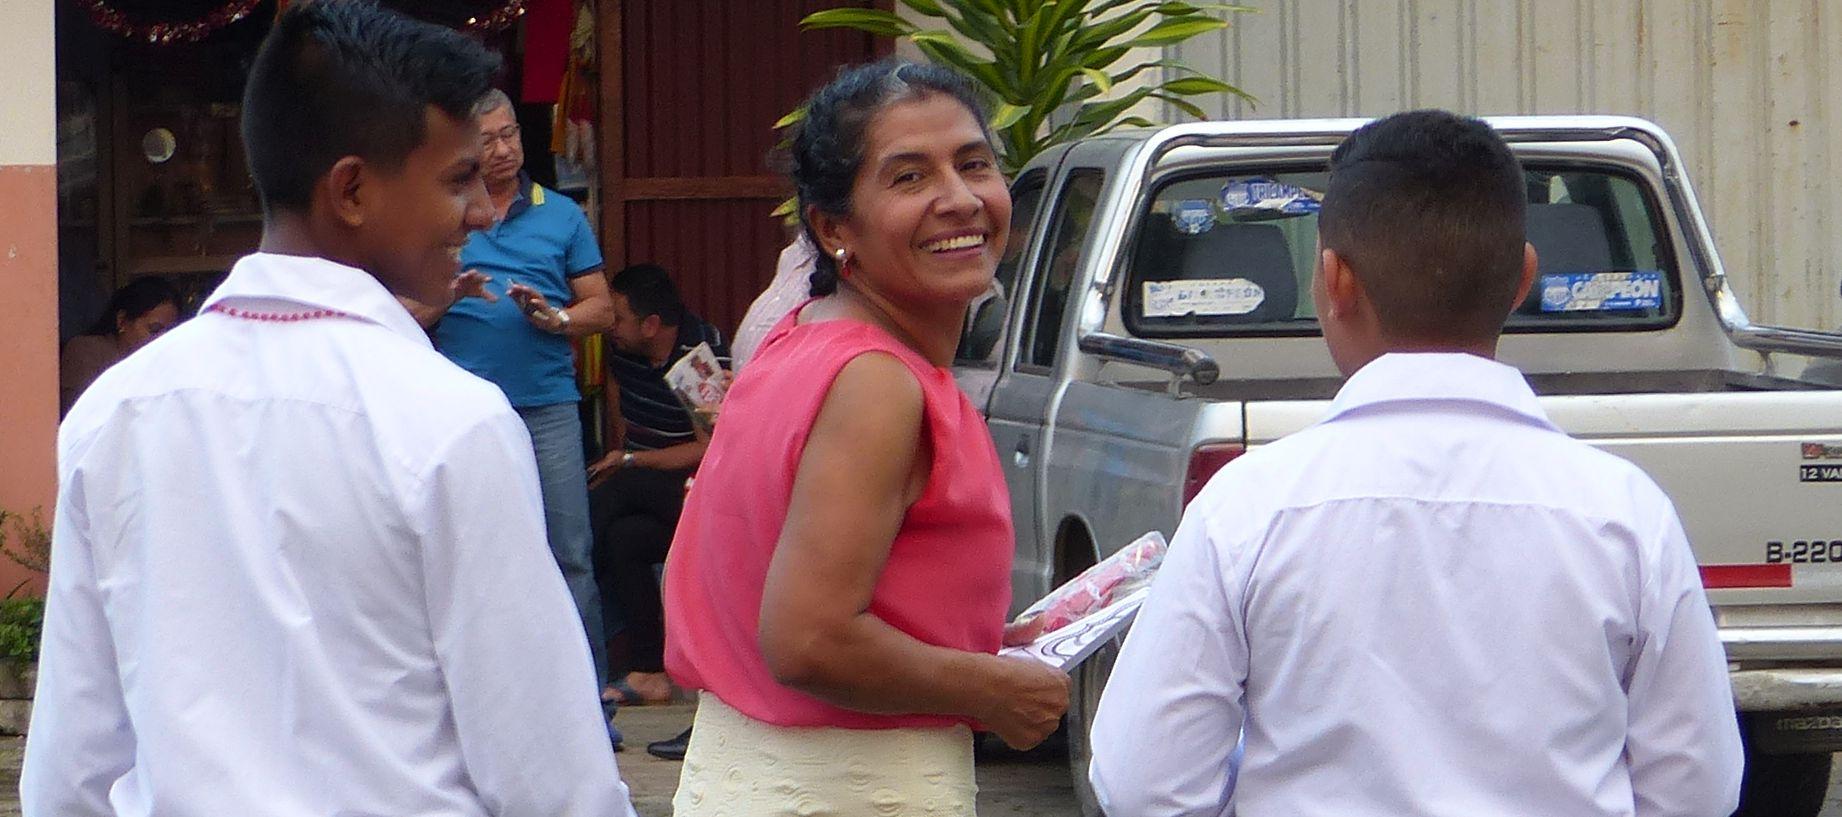 P1630537 mother y son smiles